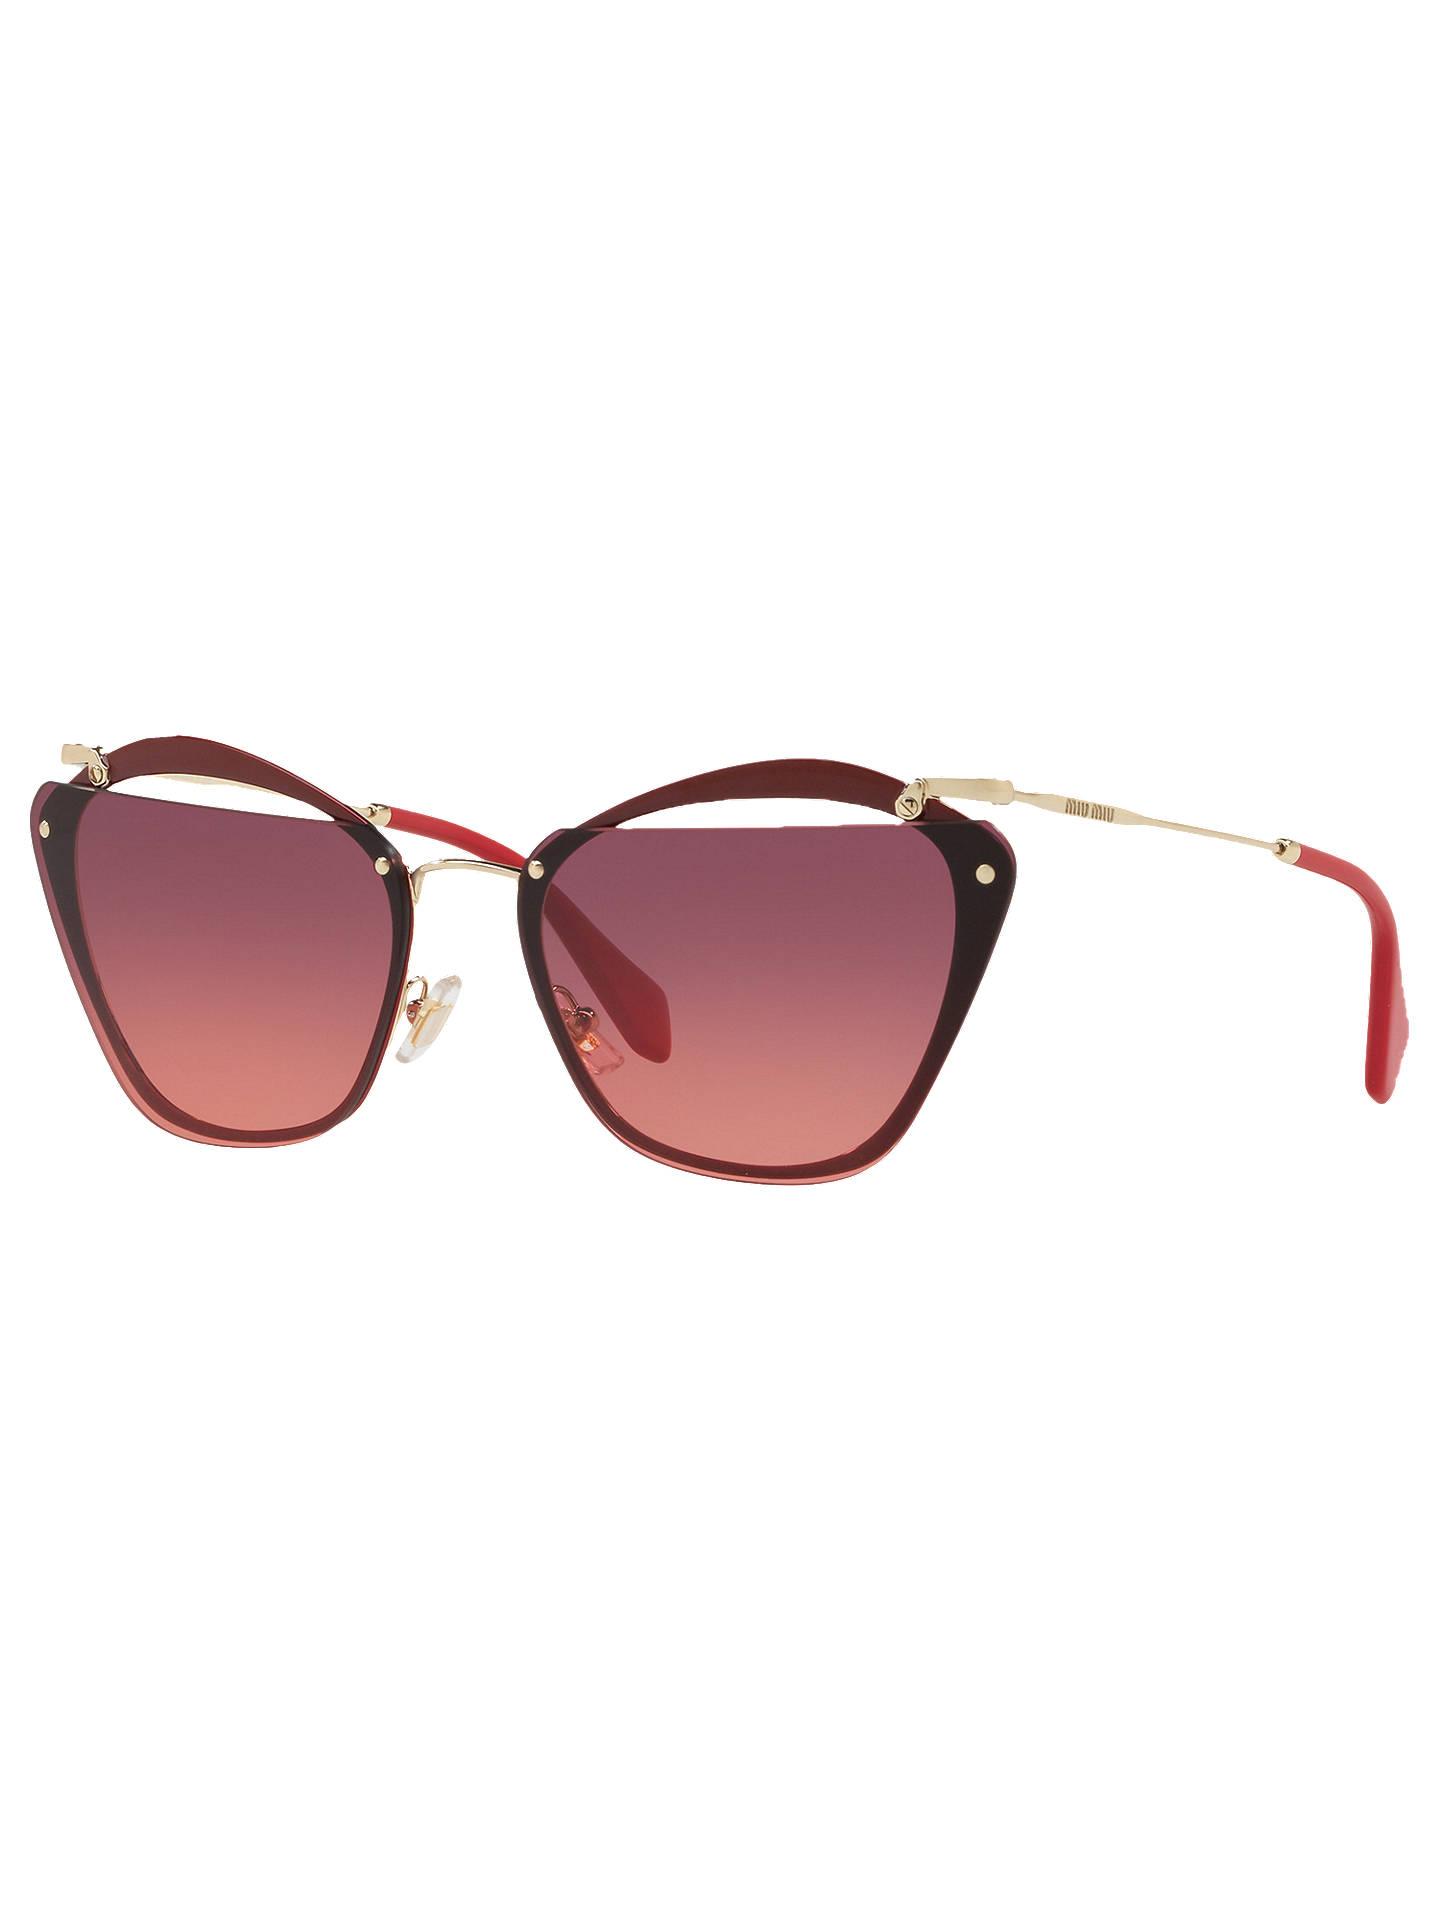 0b7139e6364 Buy Miu Miu MU54TS Polarised Square Sunglasses